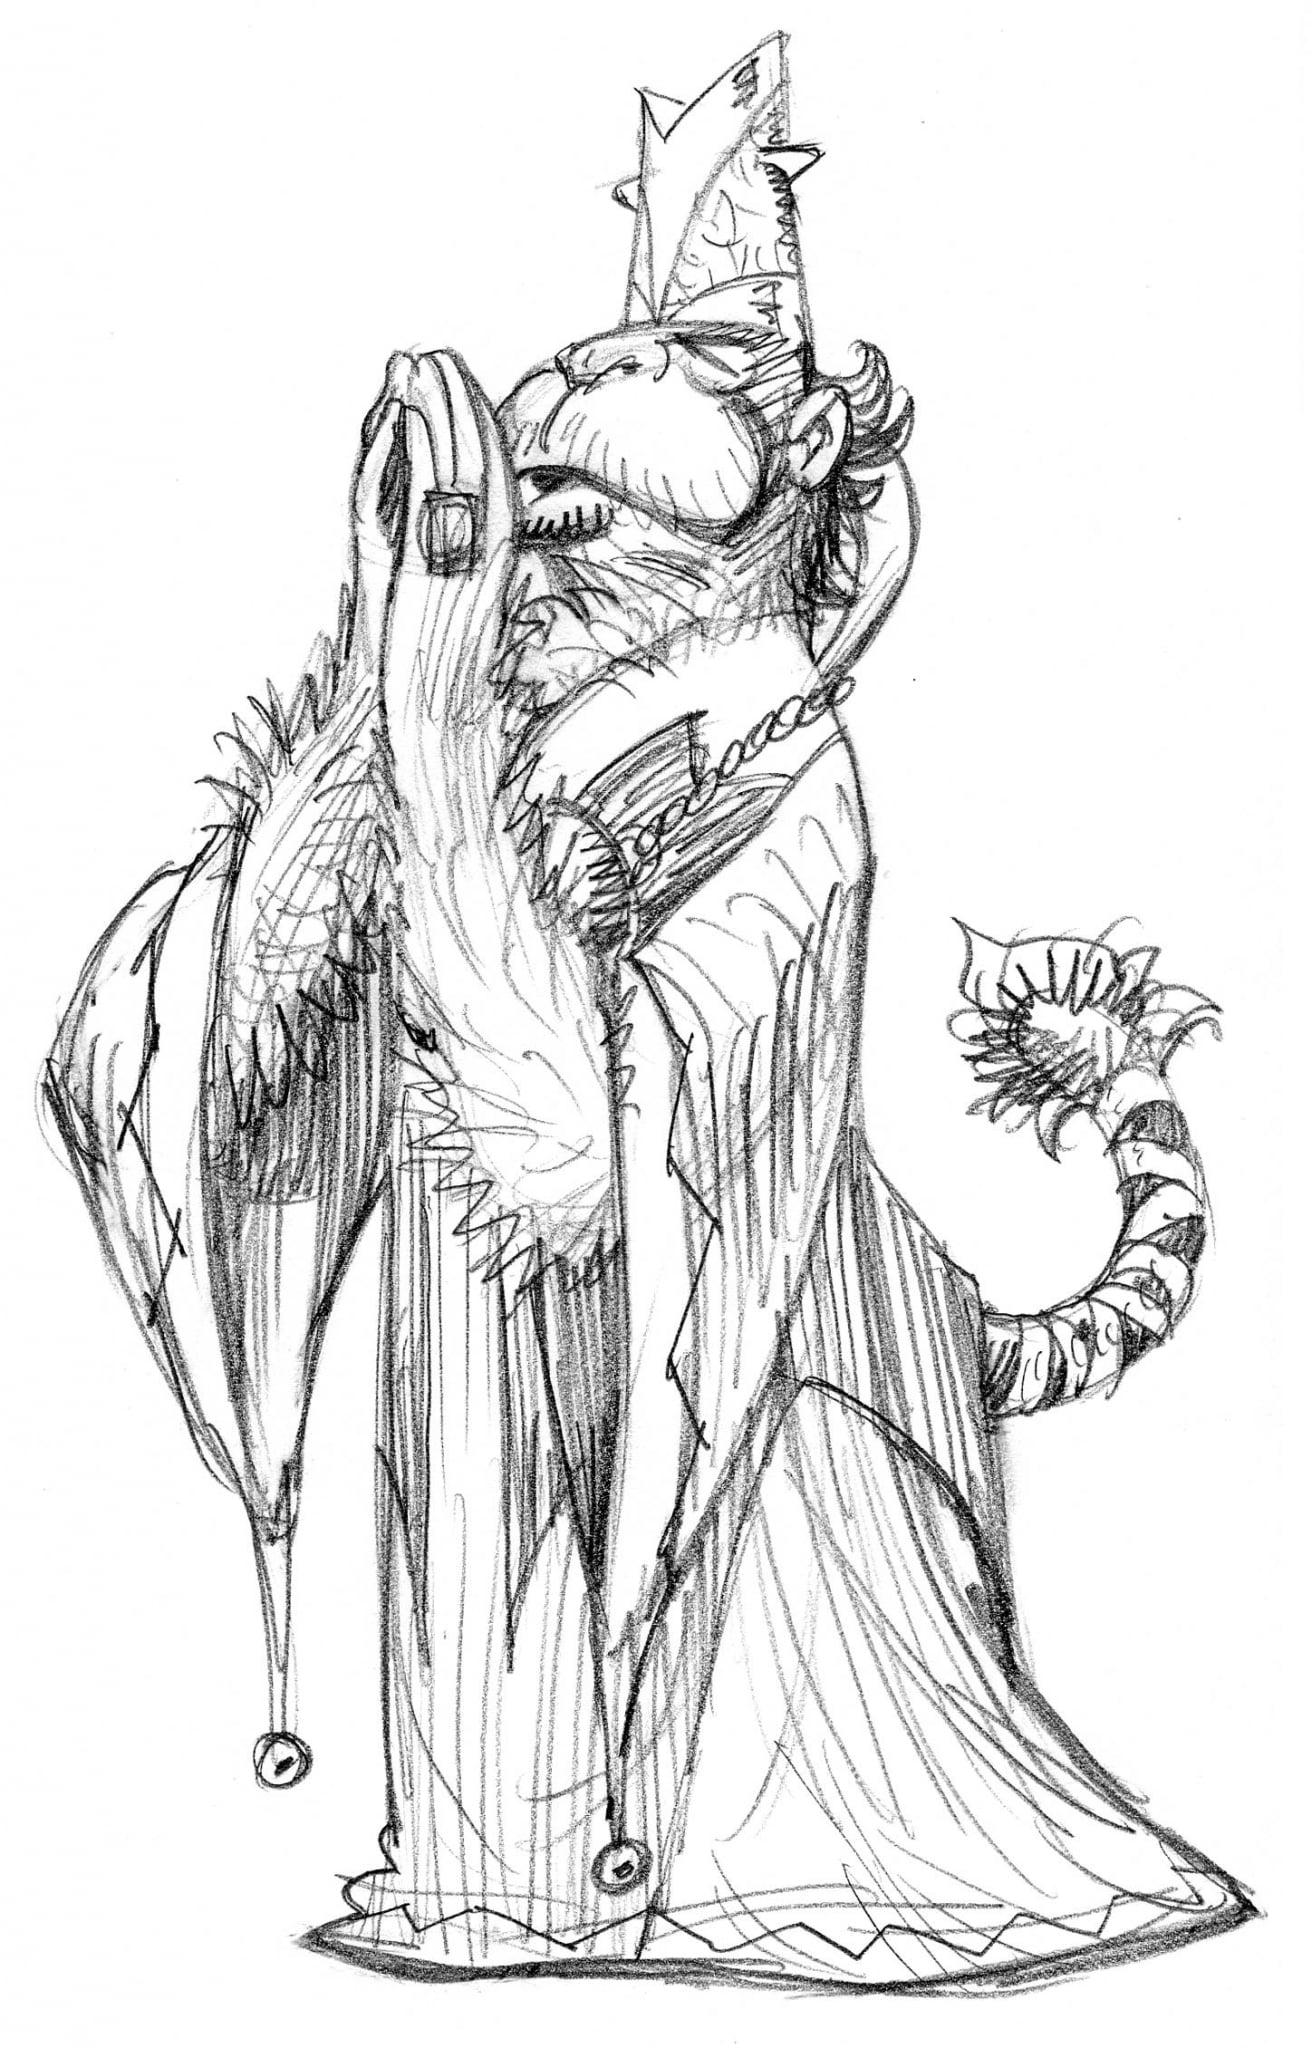 KH2900K-battle-monkeys-simian-sacerdote